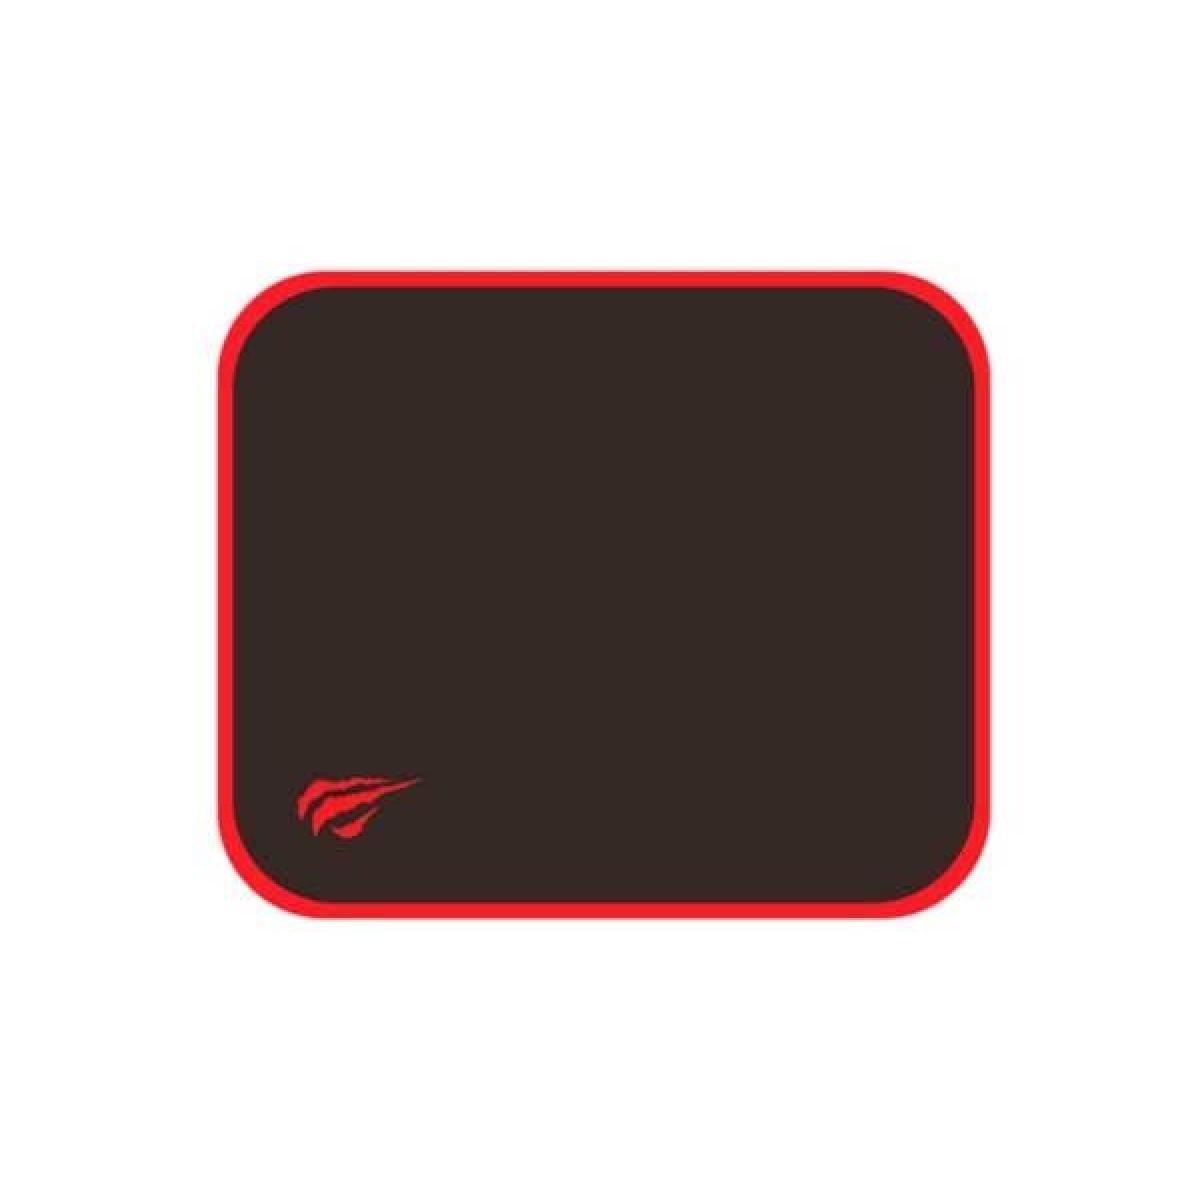 Mousepad Gamer Havit MP839, Pequeno, Black/Red, HV-MP839